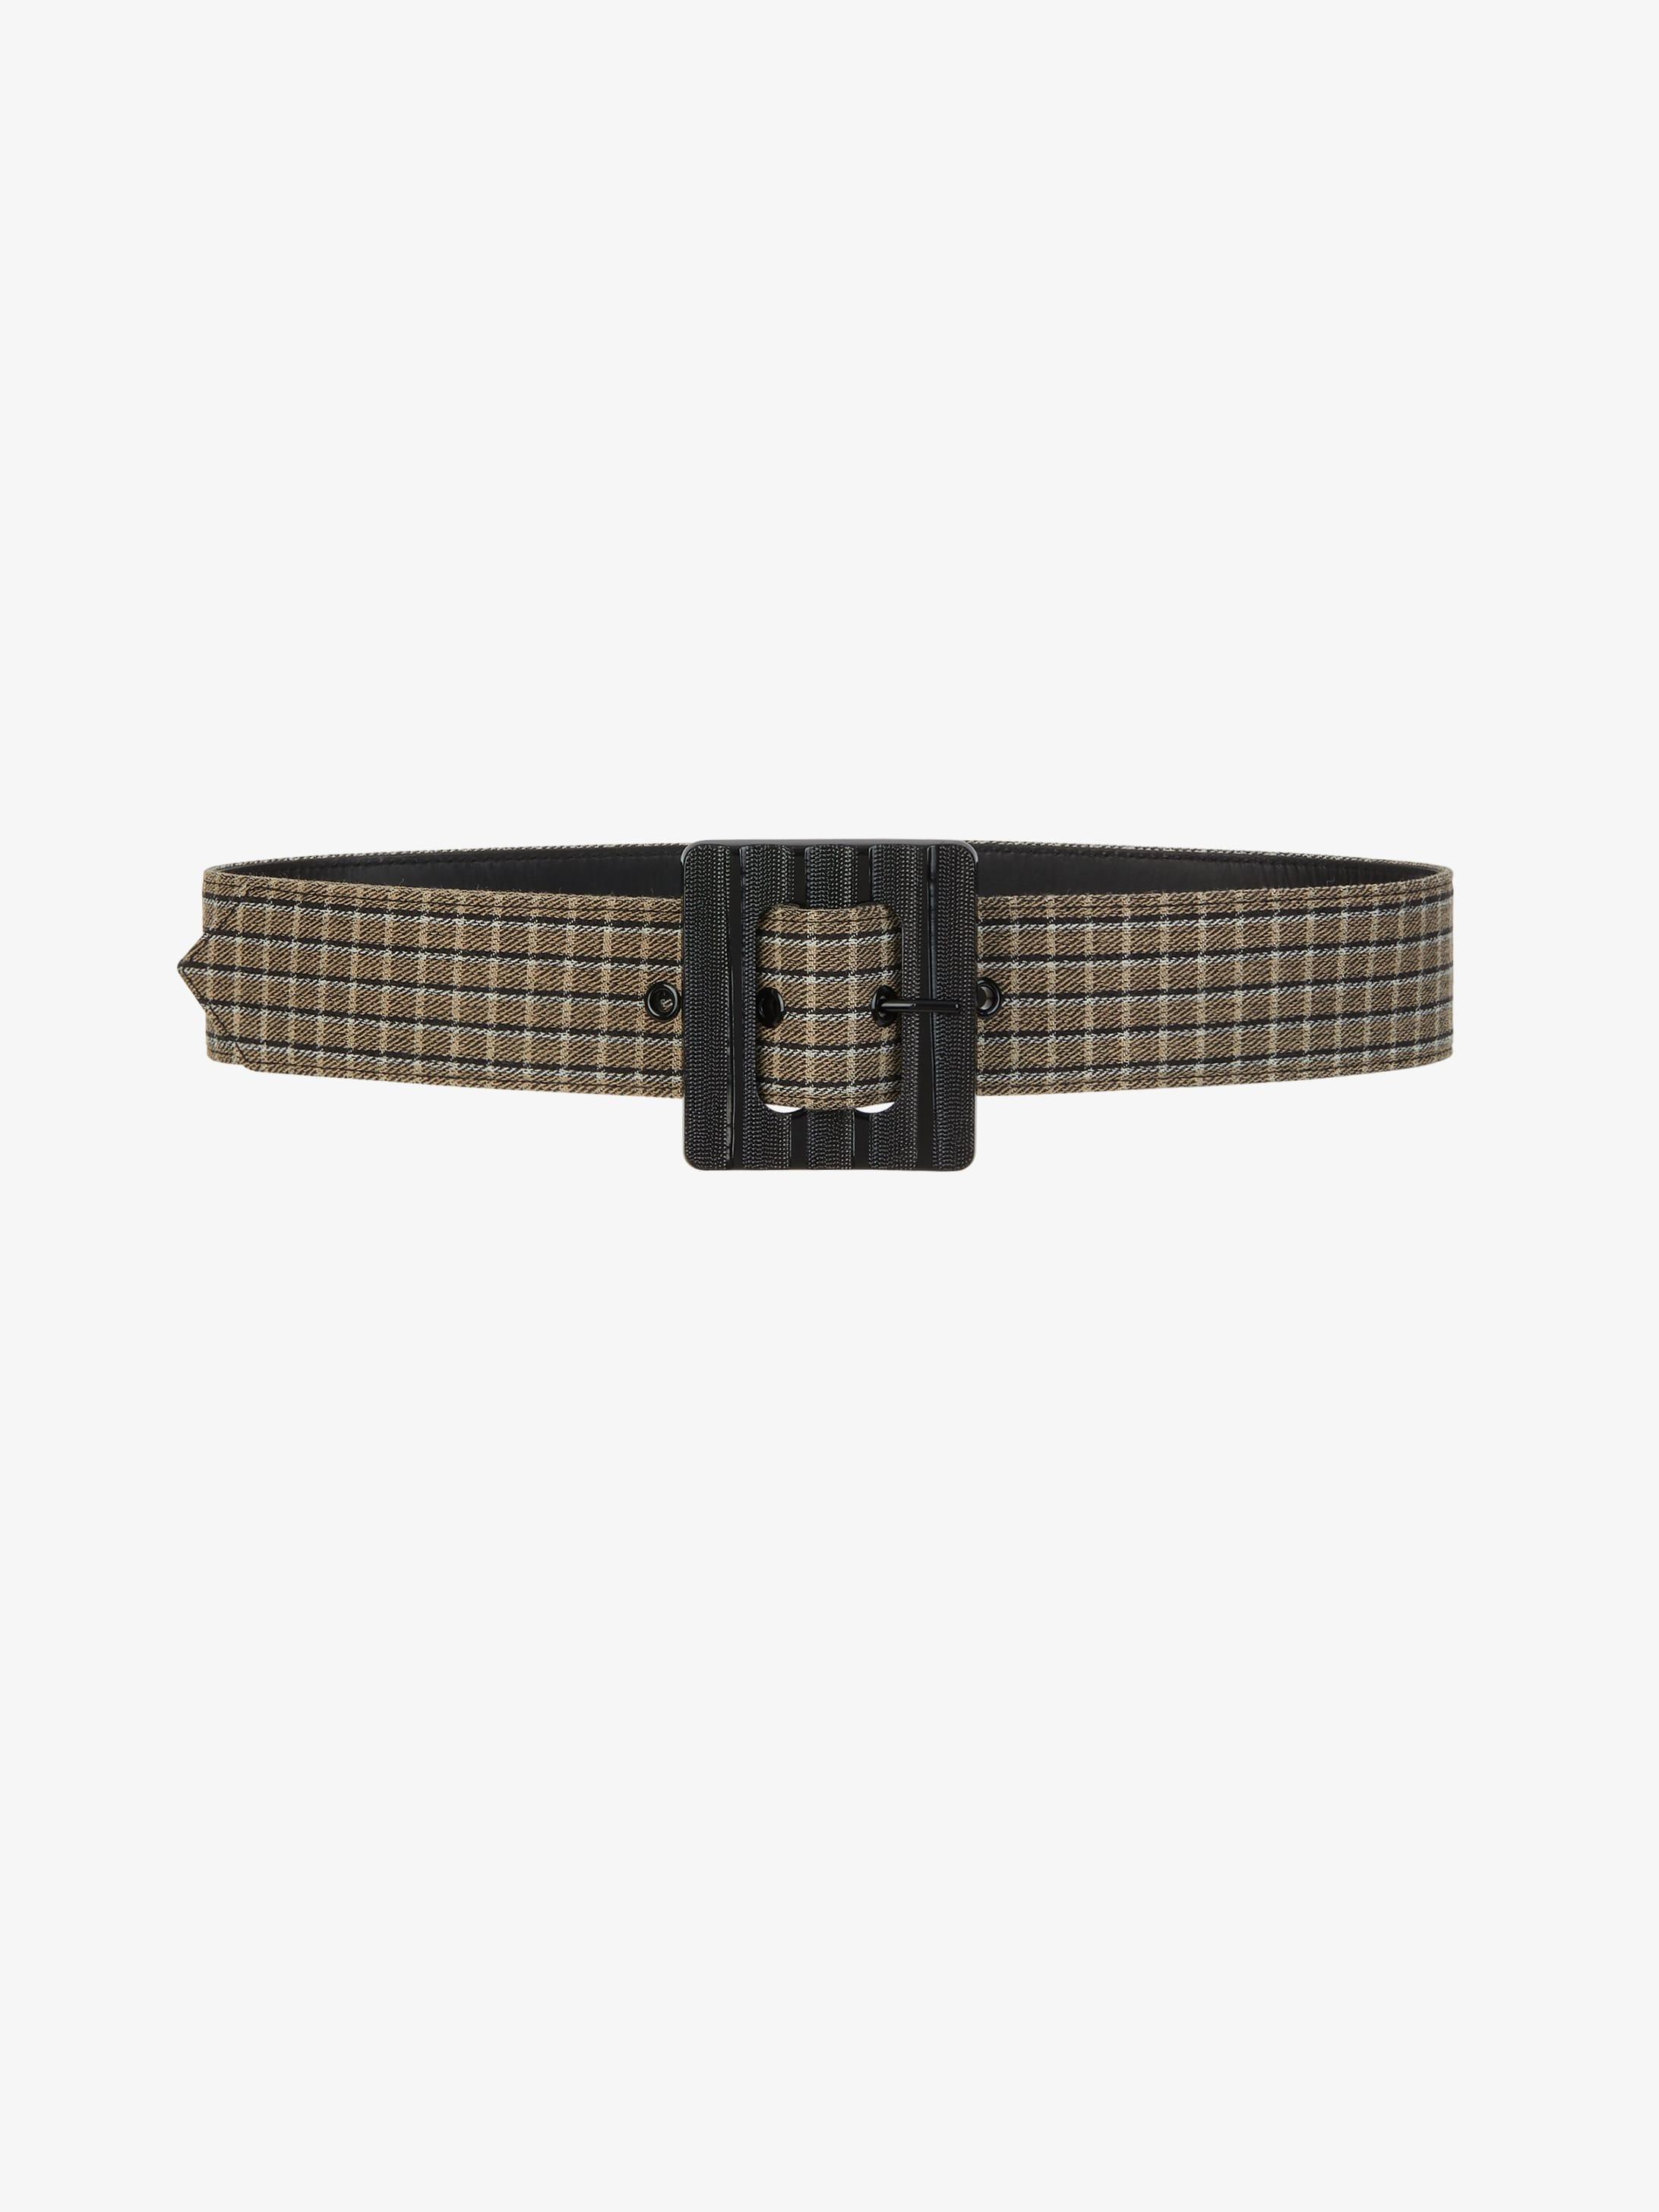 Checked wool belt